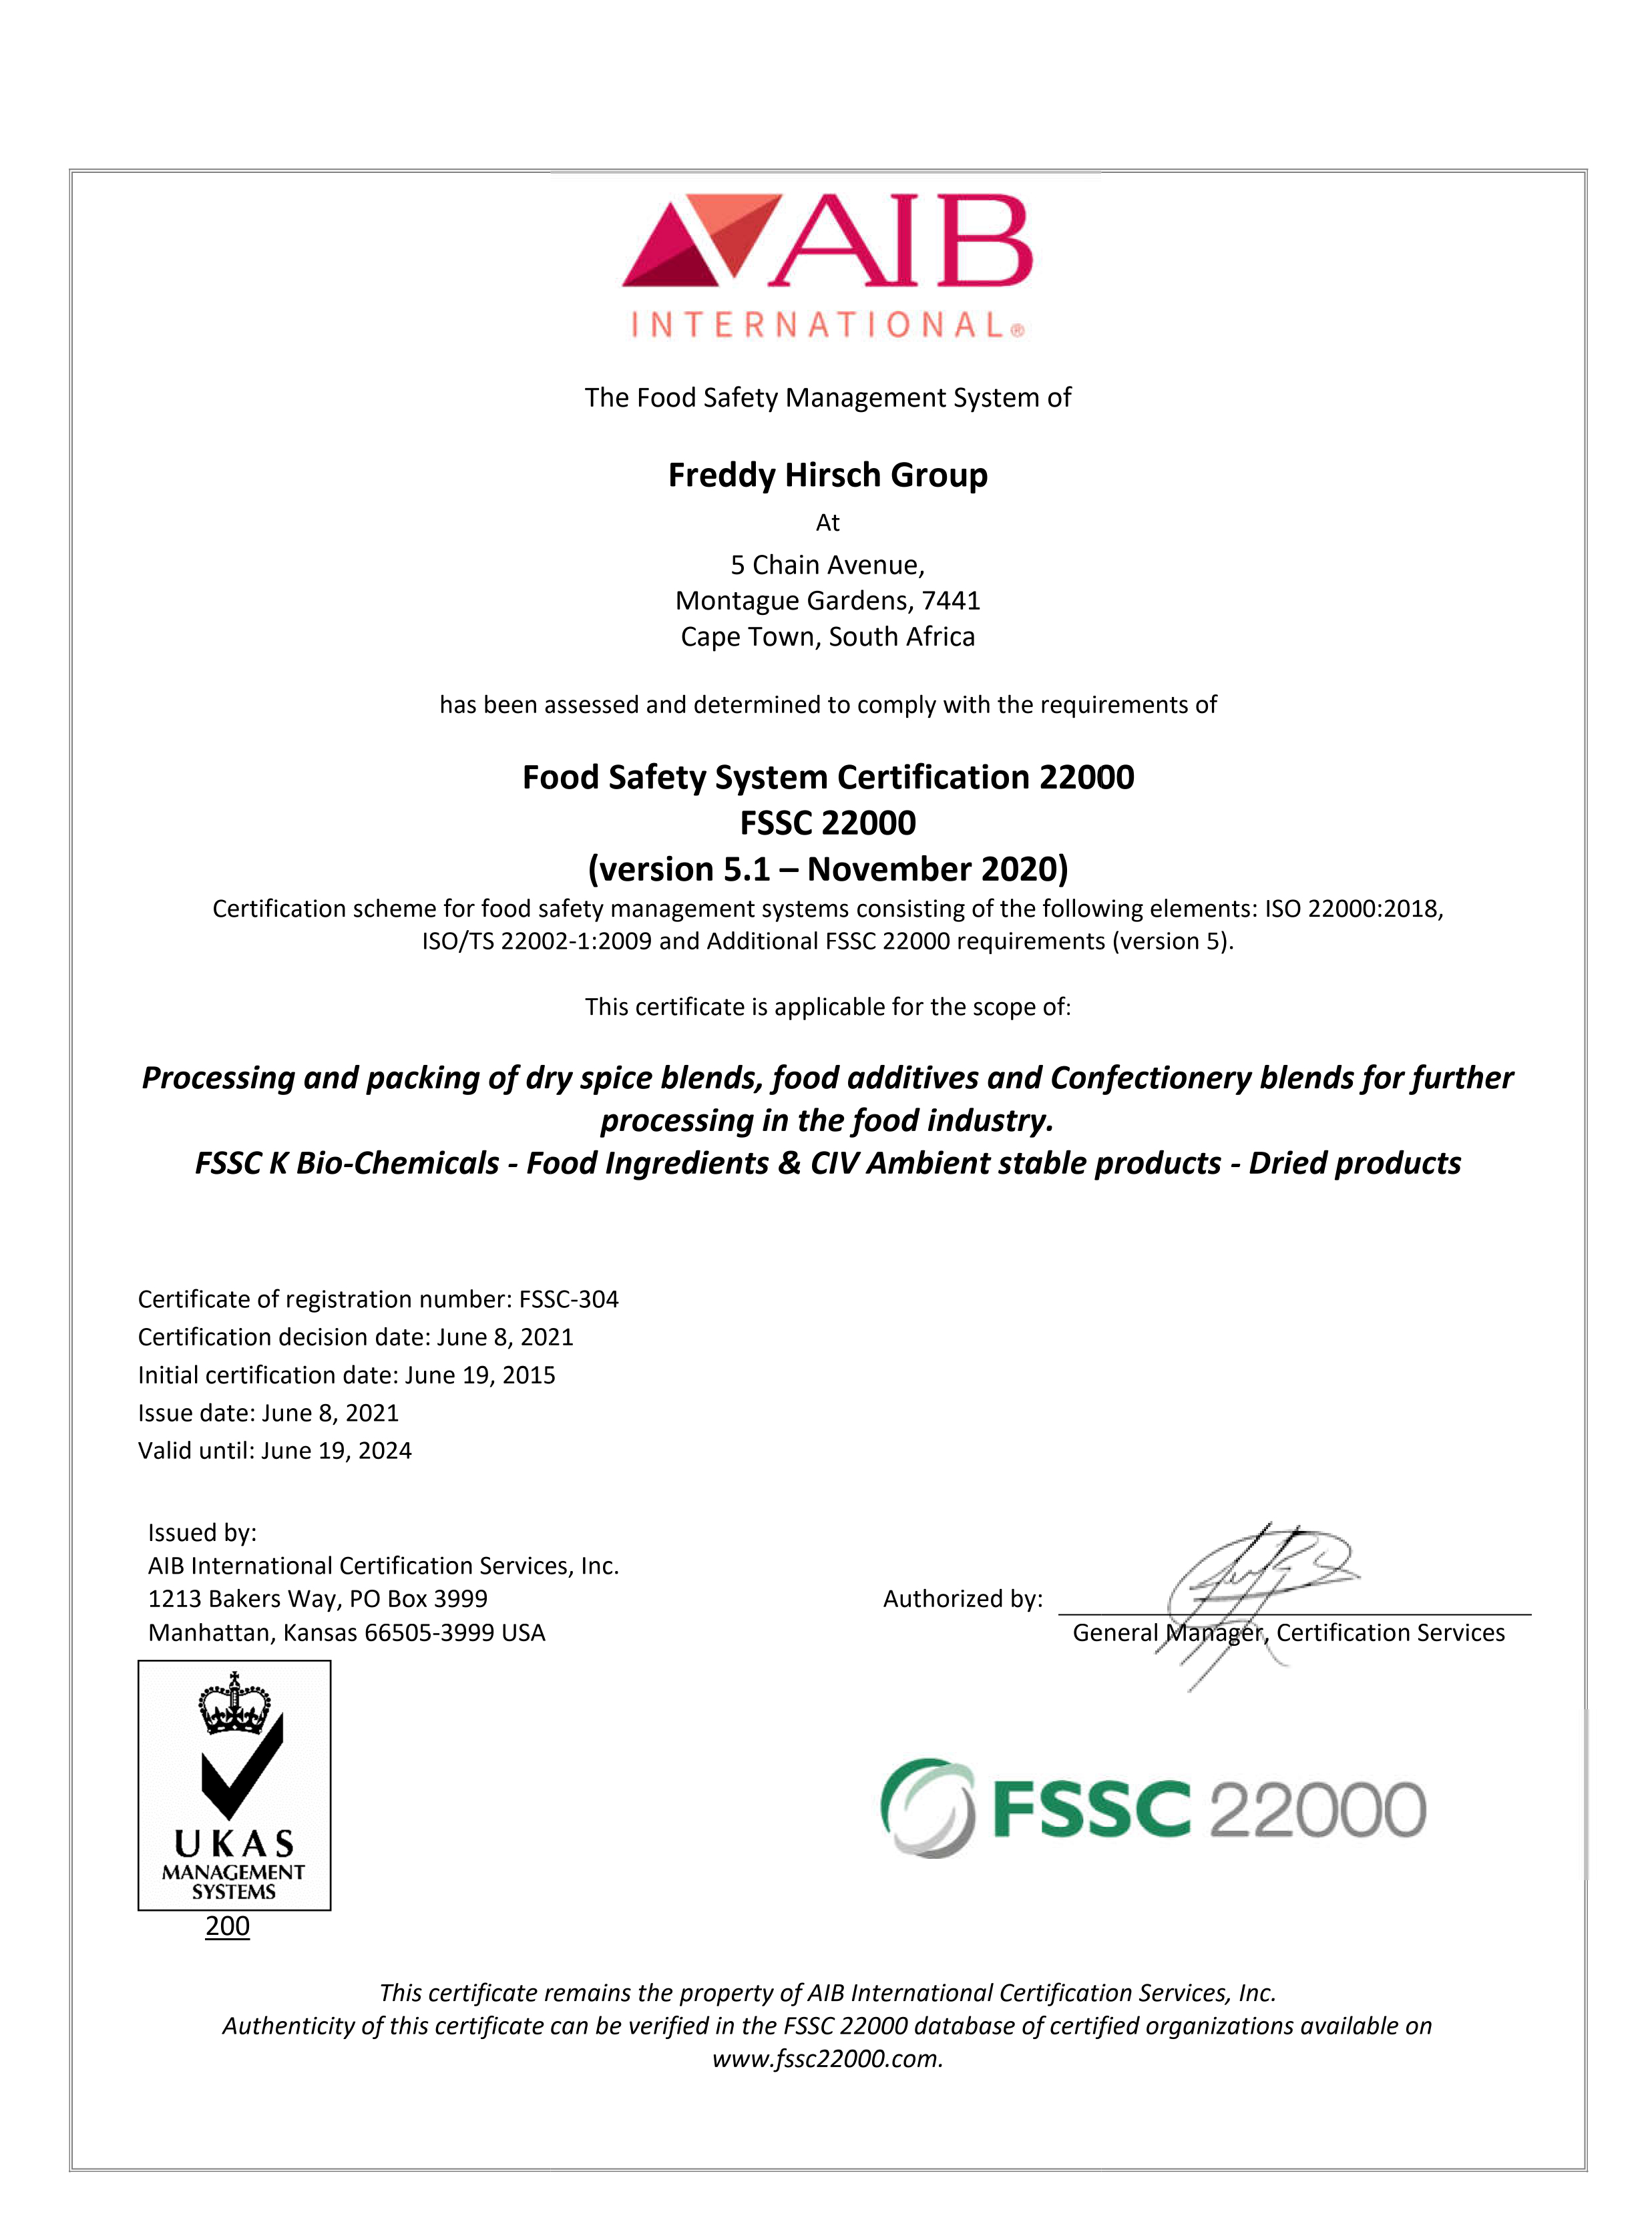 FSSC 22000 CERTIFICATE FROM AIB INTERNATIONAL CERTIFICATION SERVICES